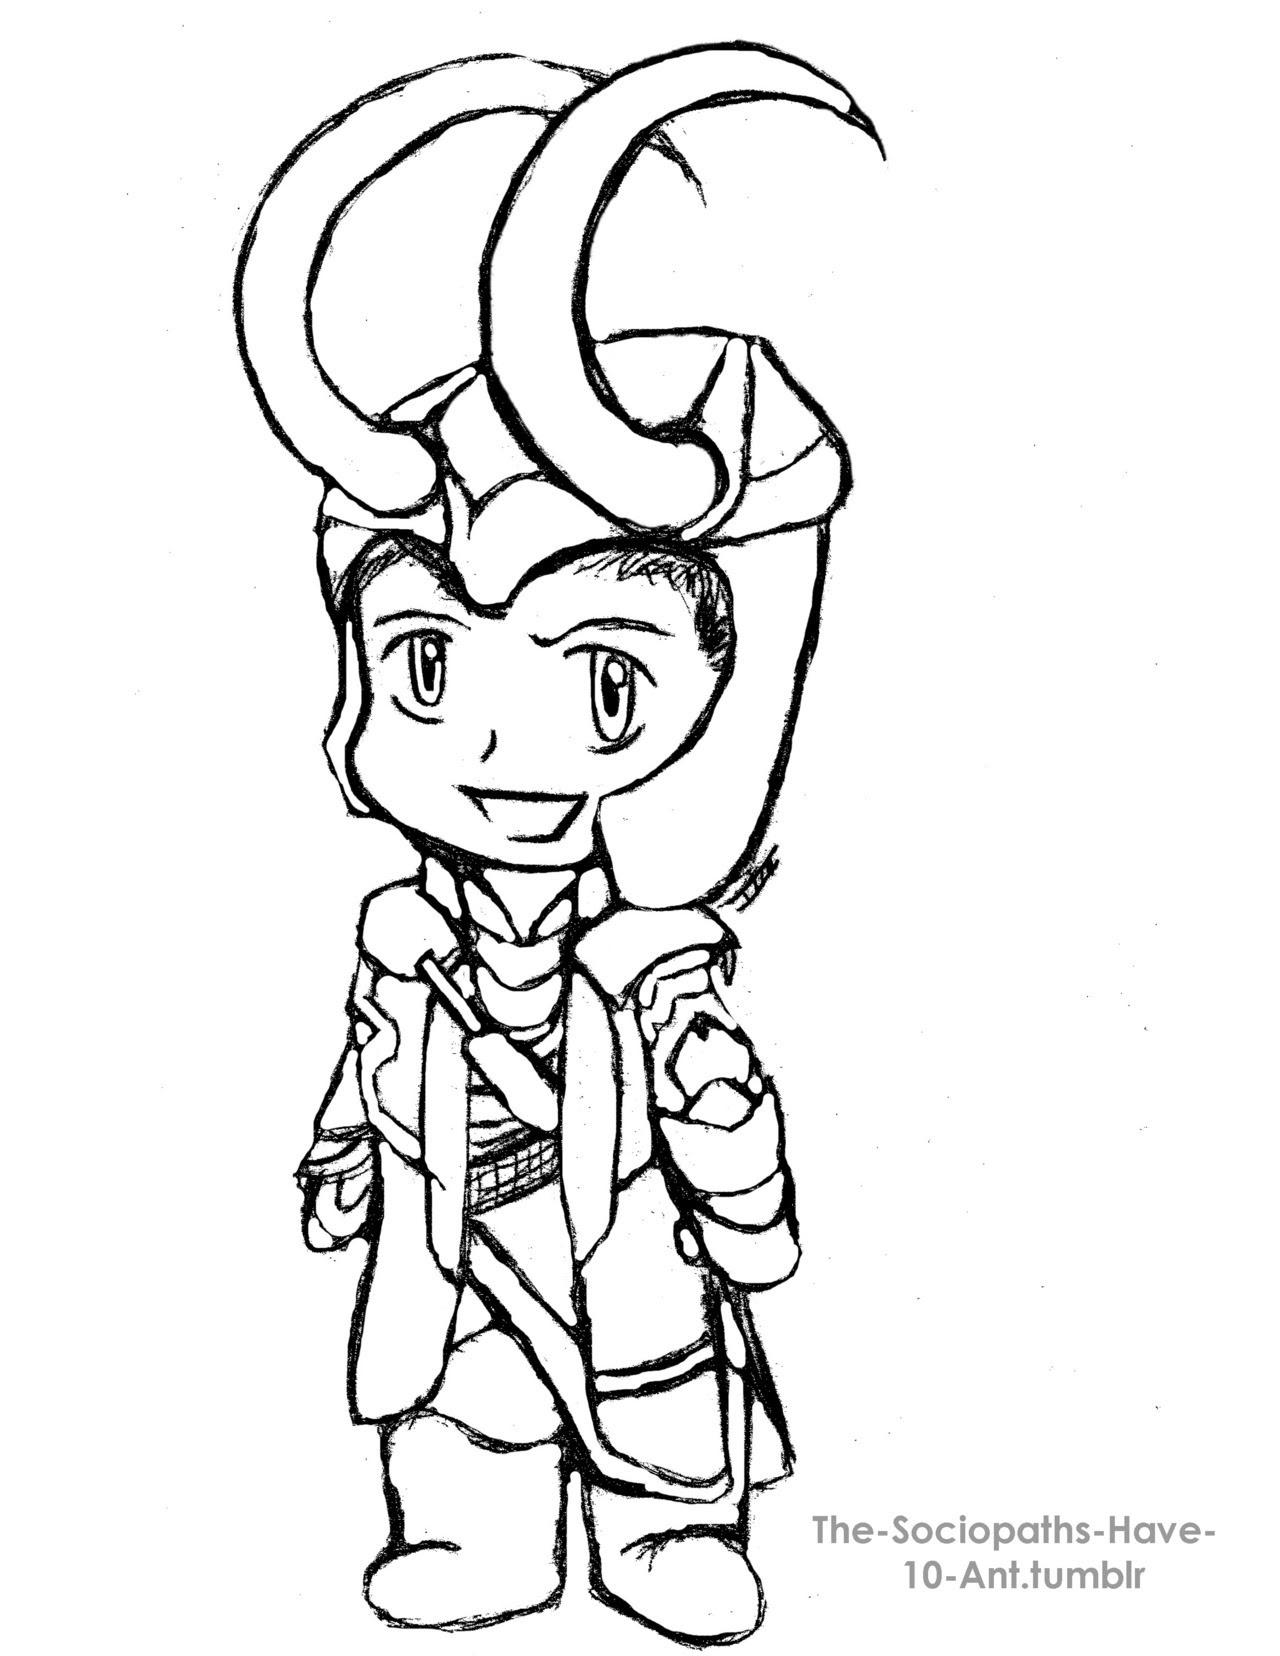 Loki Laufeyson sketch by NatachiXD on DeviantArt - Coloring Pages